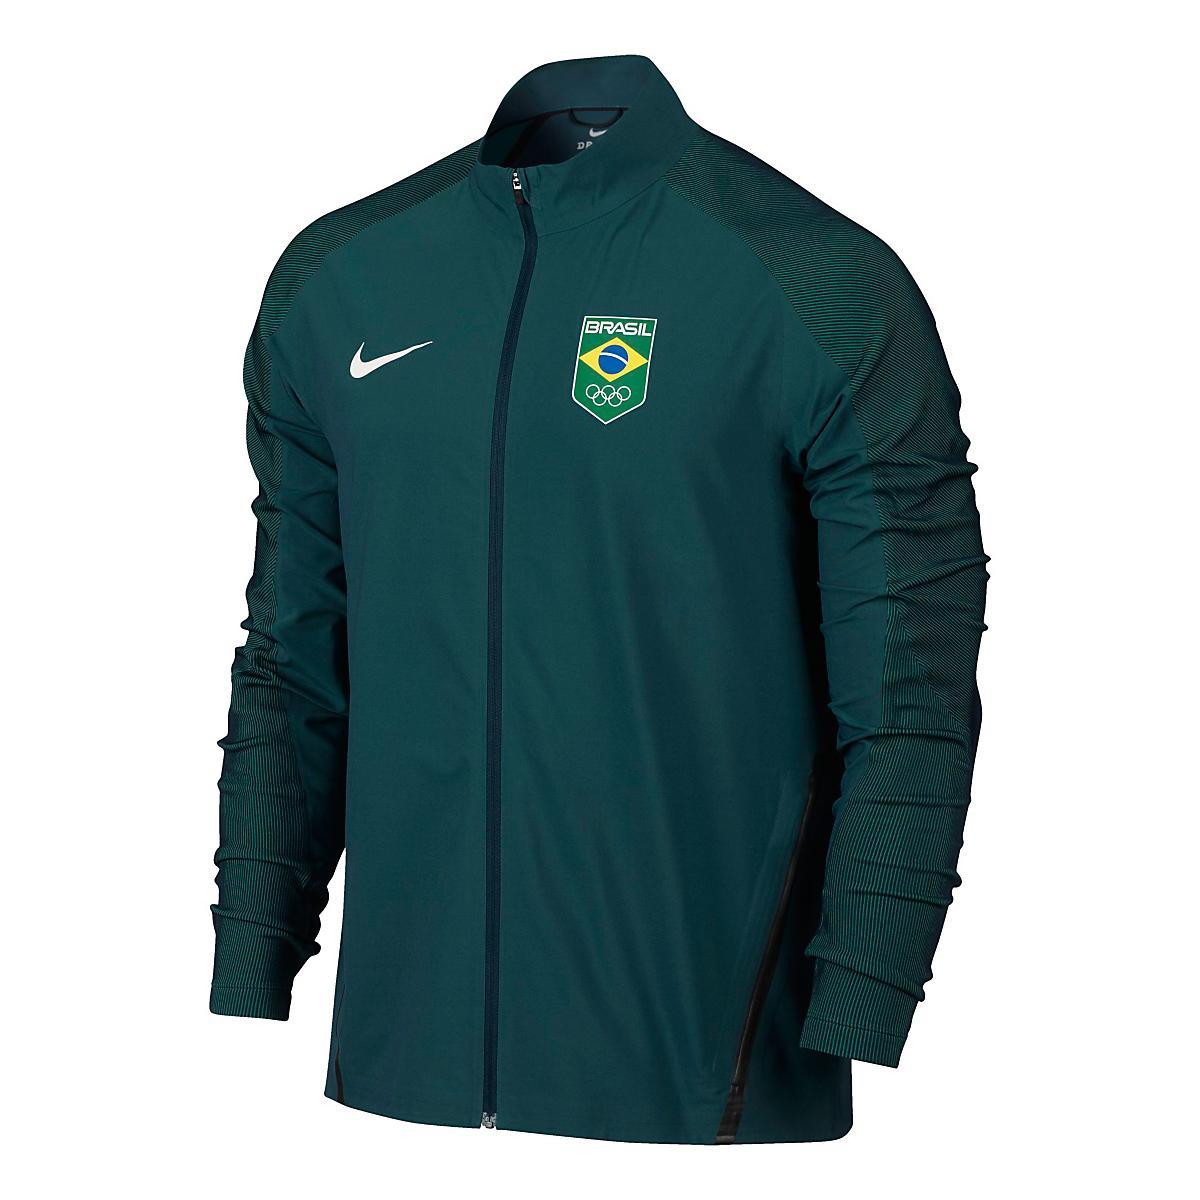 Men's Nike�COB Stadium Jacket